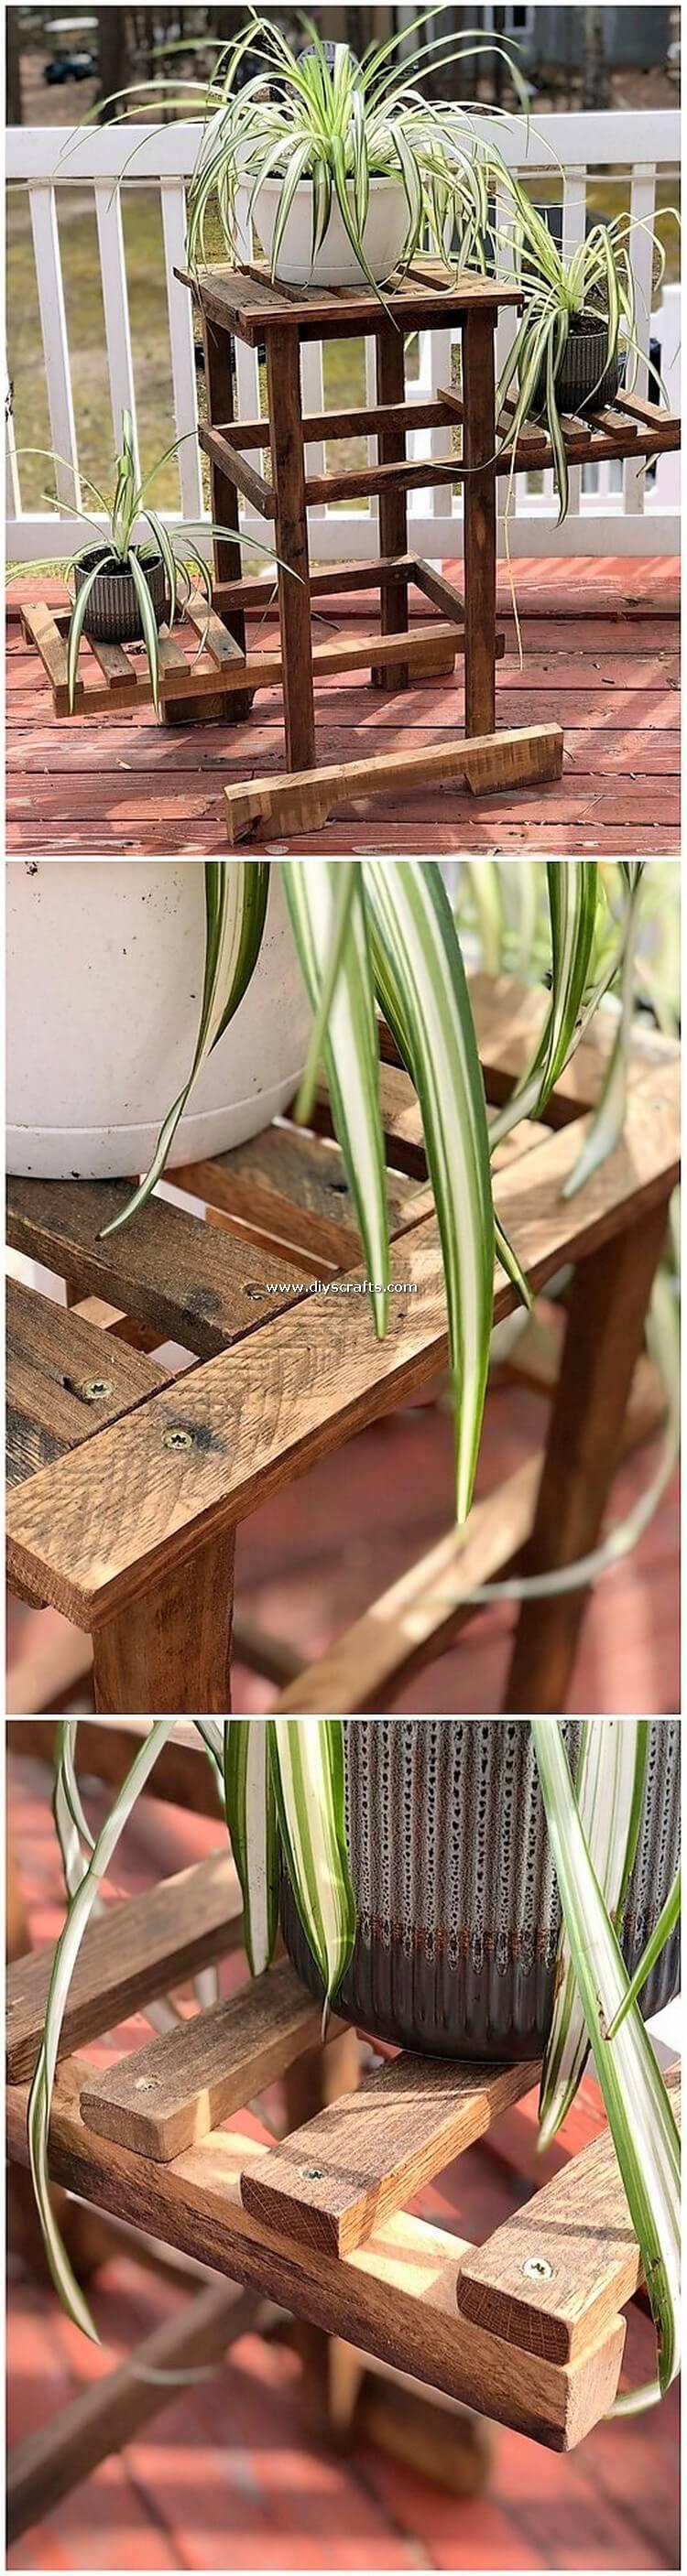 Pallet-Wood-Pots-Stand